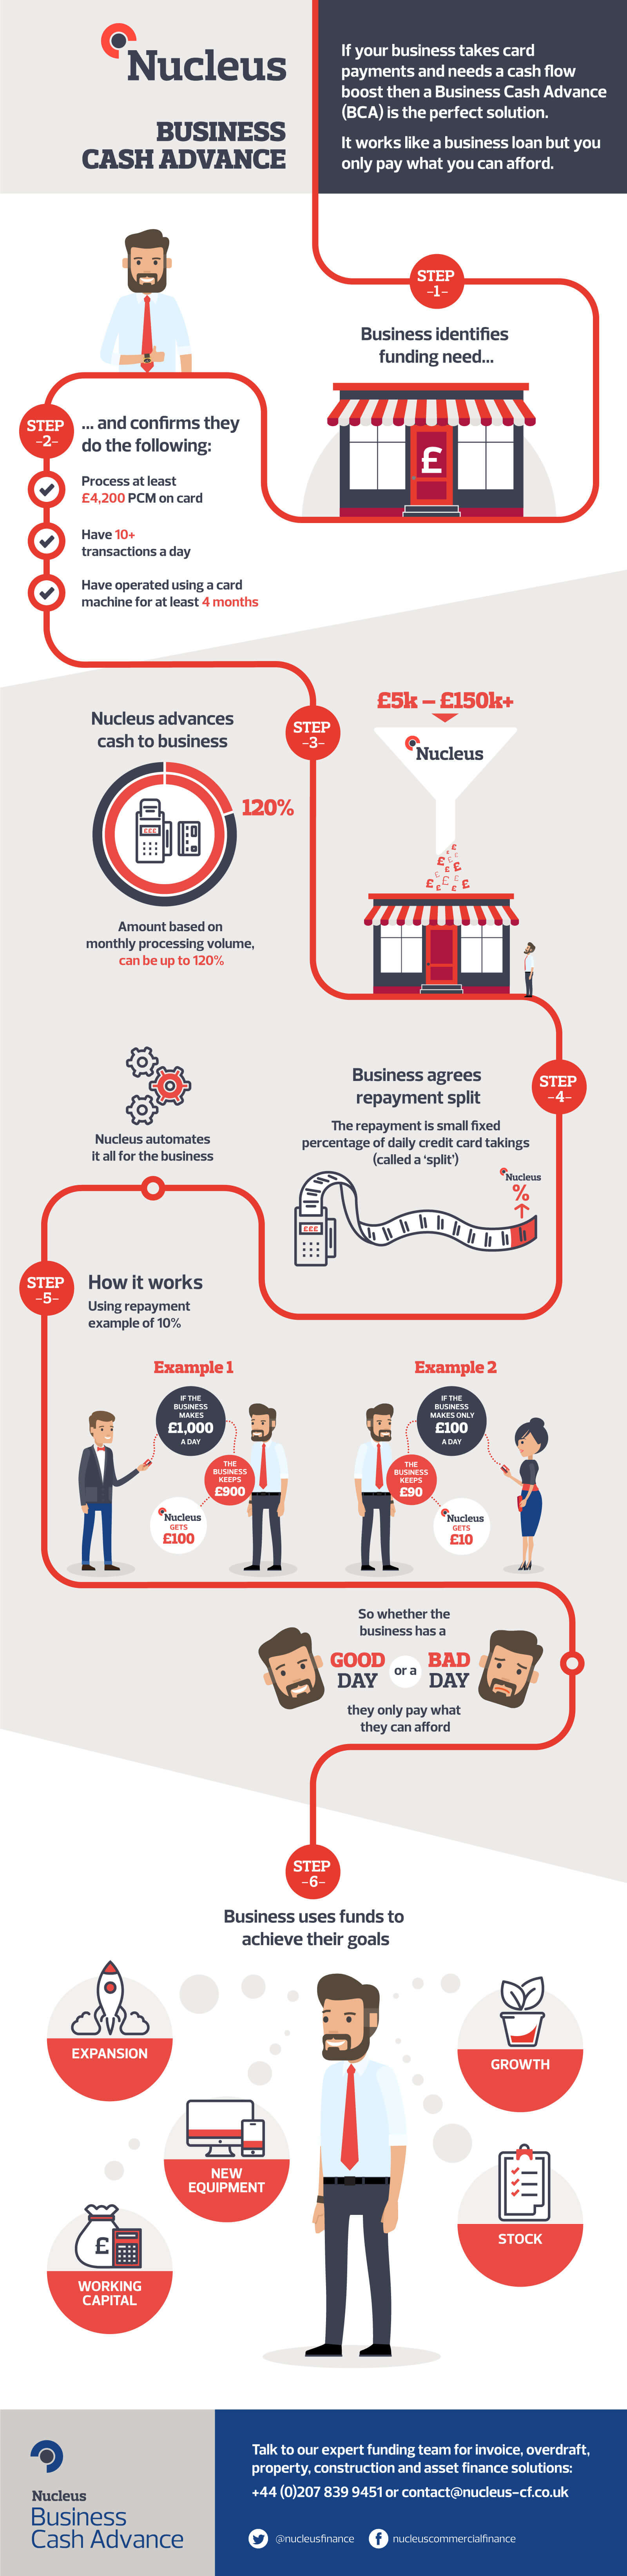 Business-Cash-Advance-infographic_v5.jpg